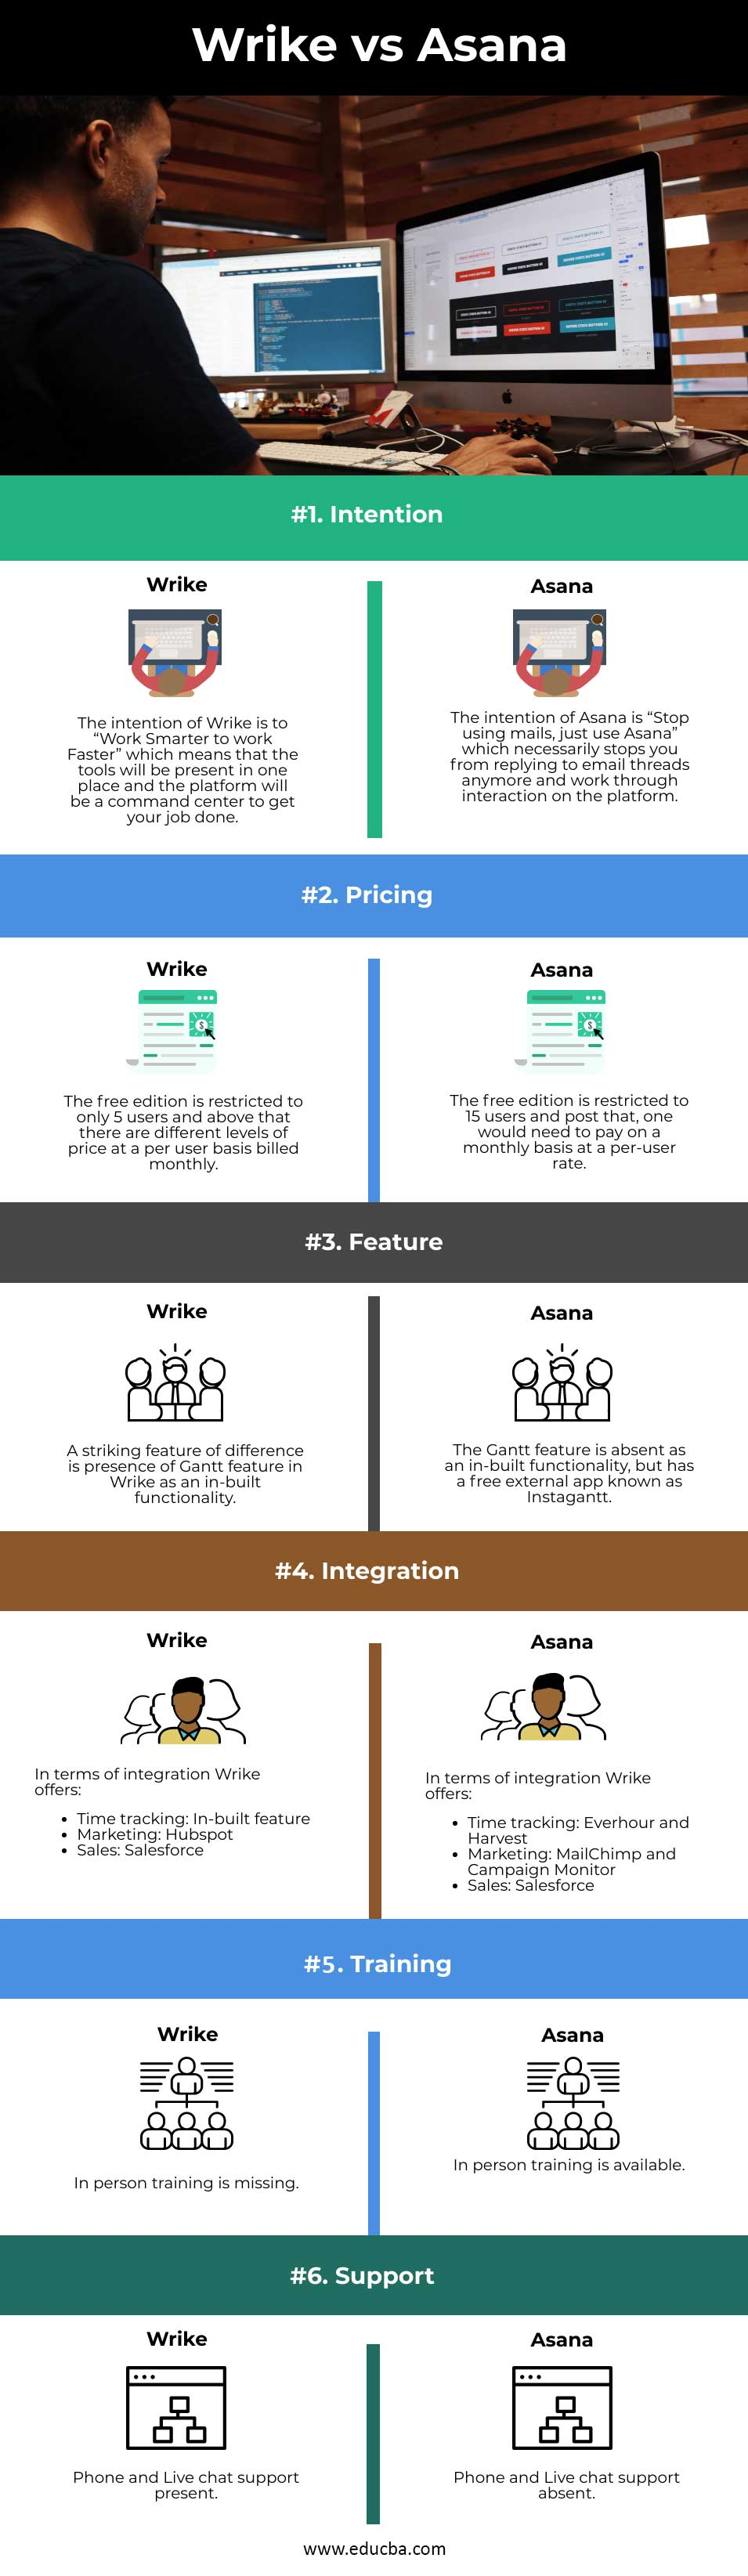 Wrike-vs-Asana-info